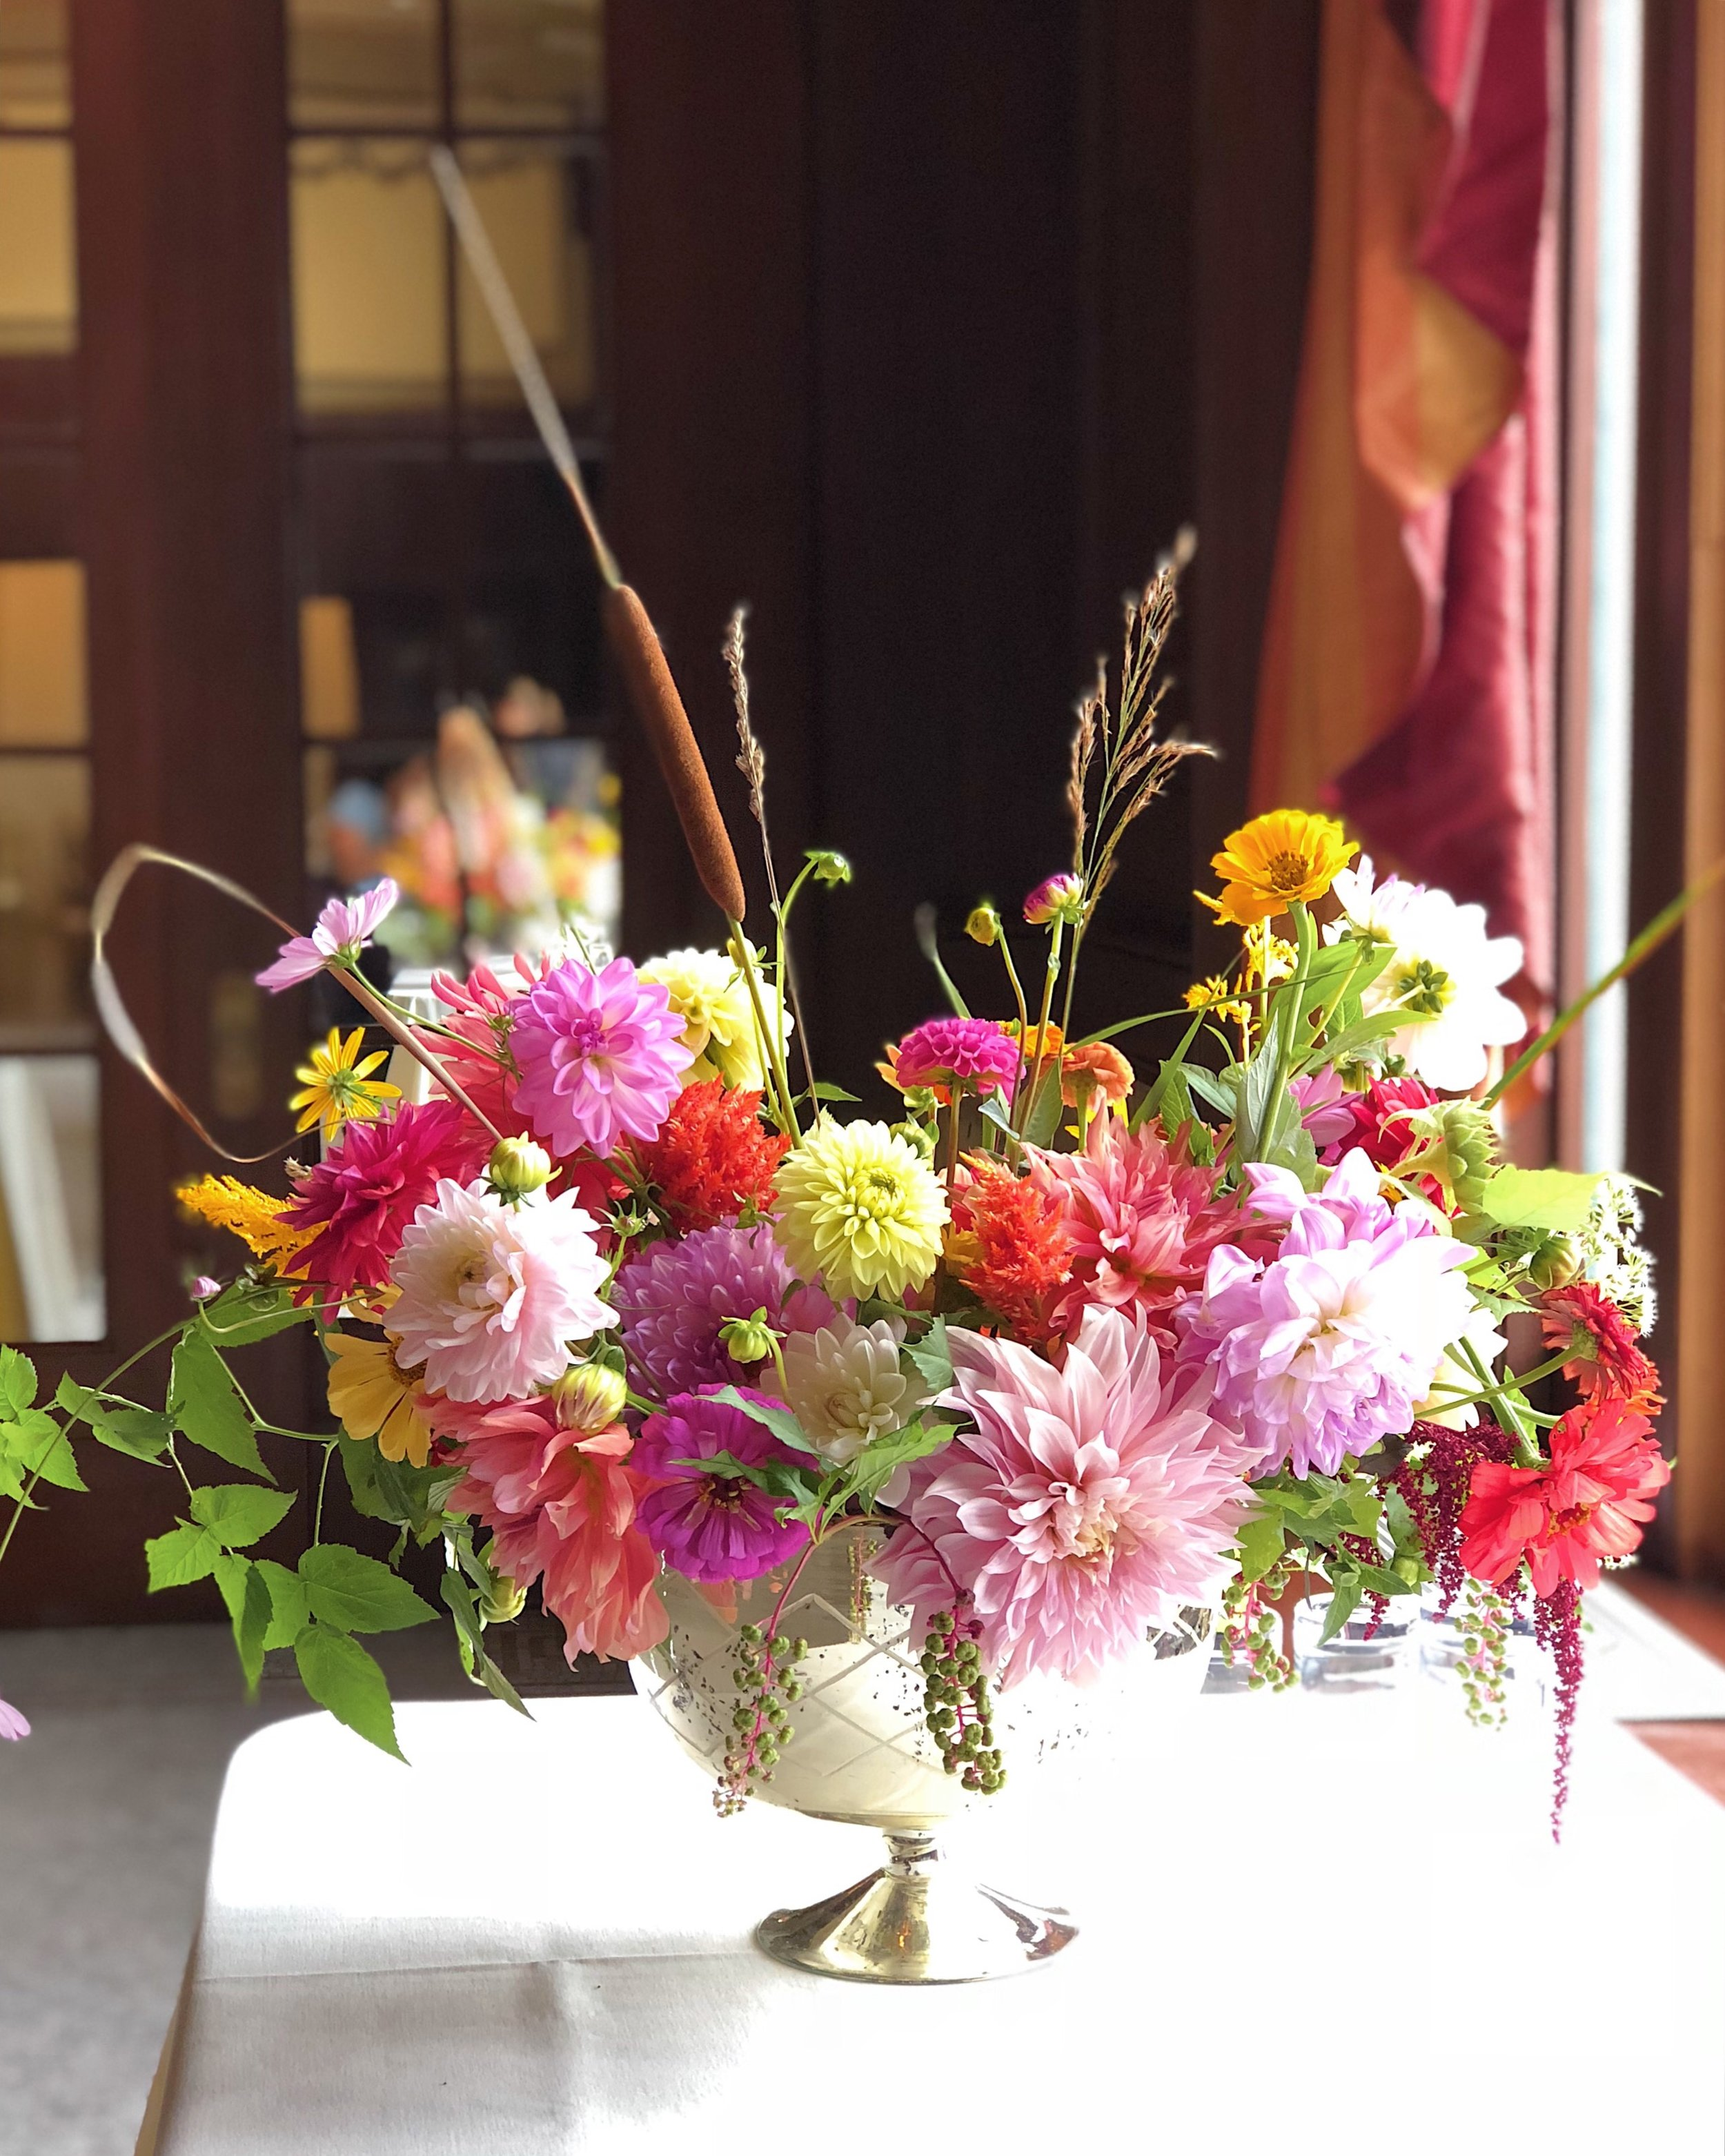 moonrise floral Arrangement.JPG